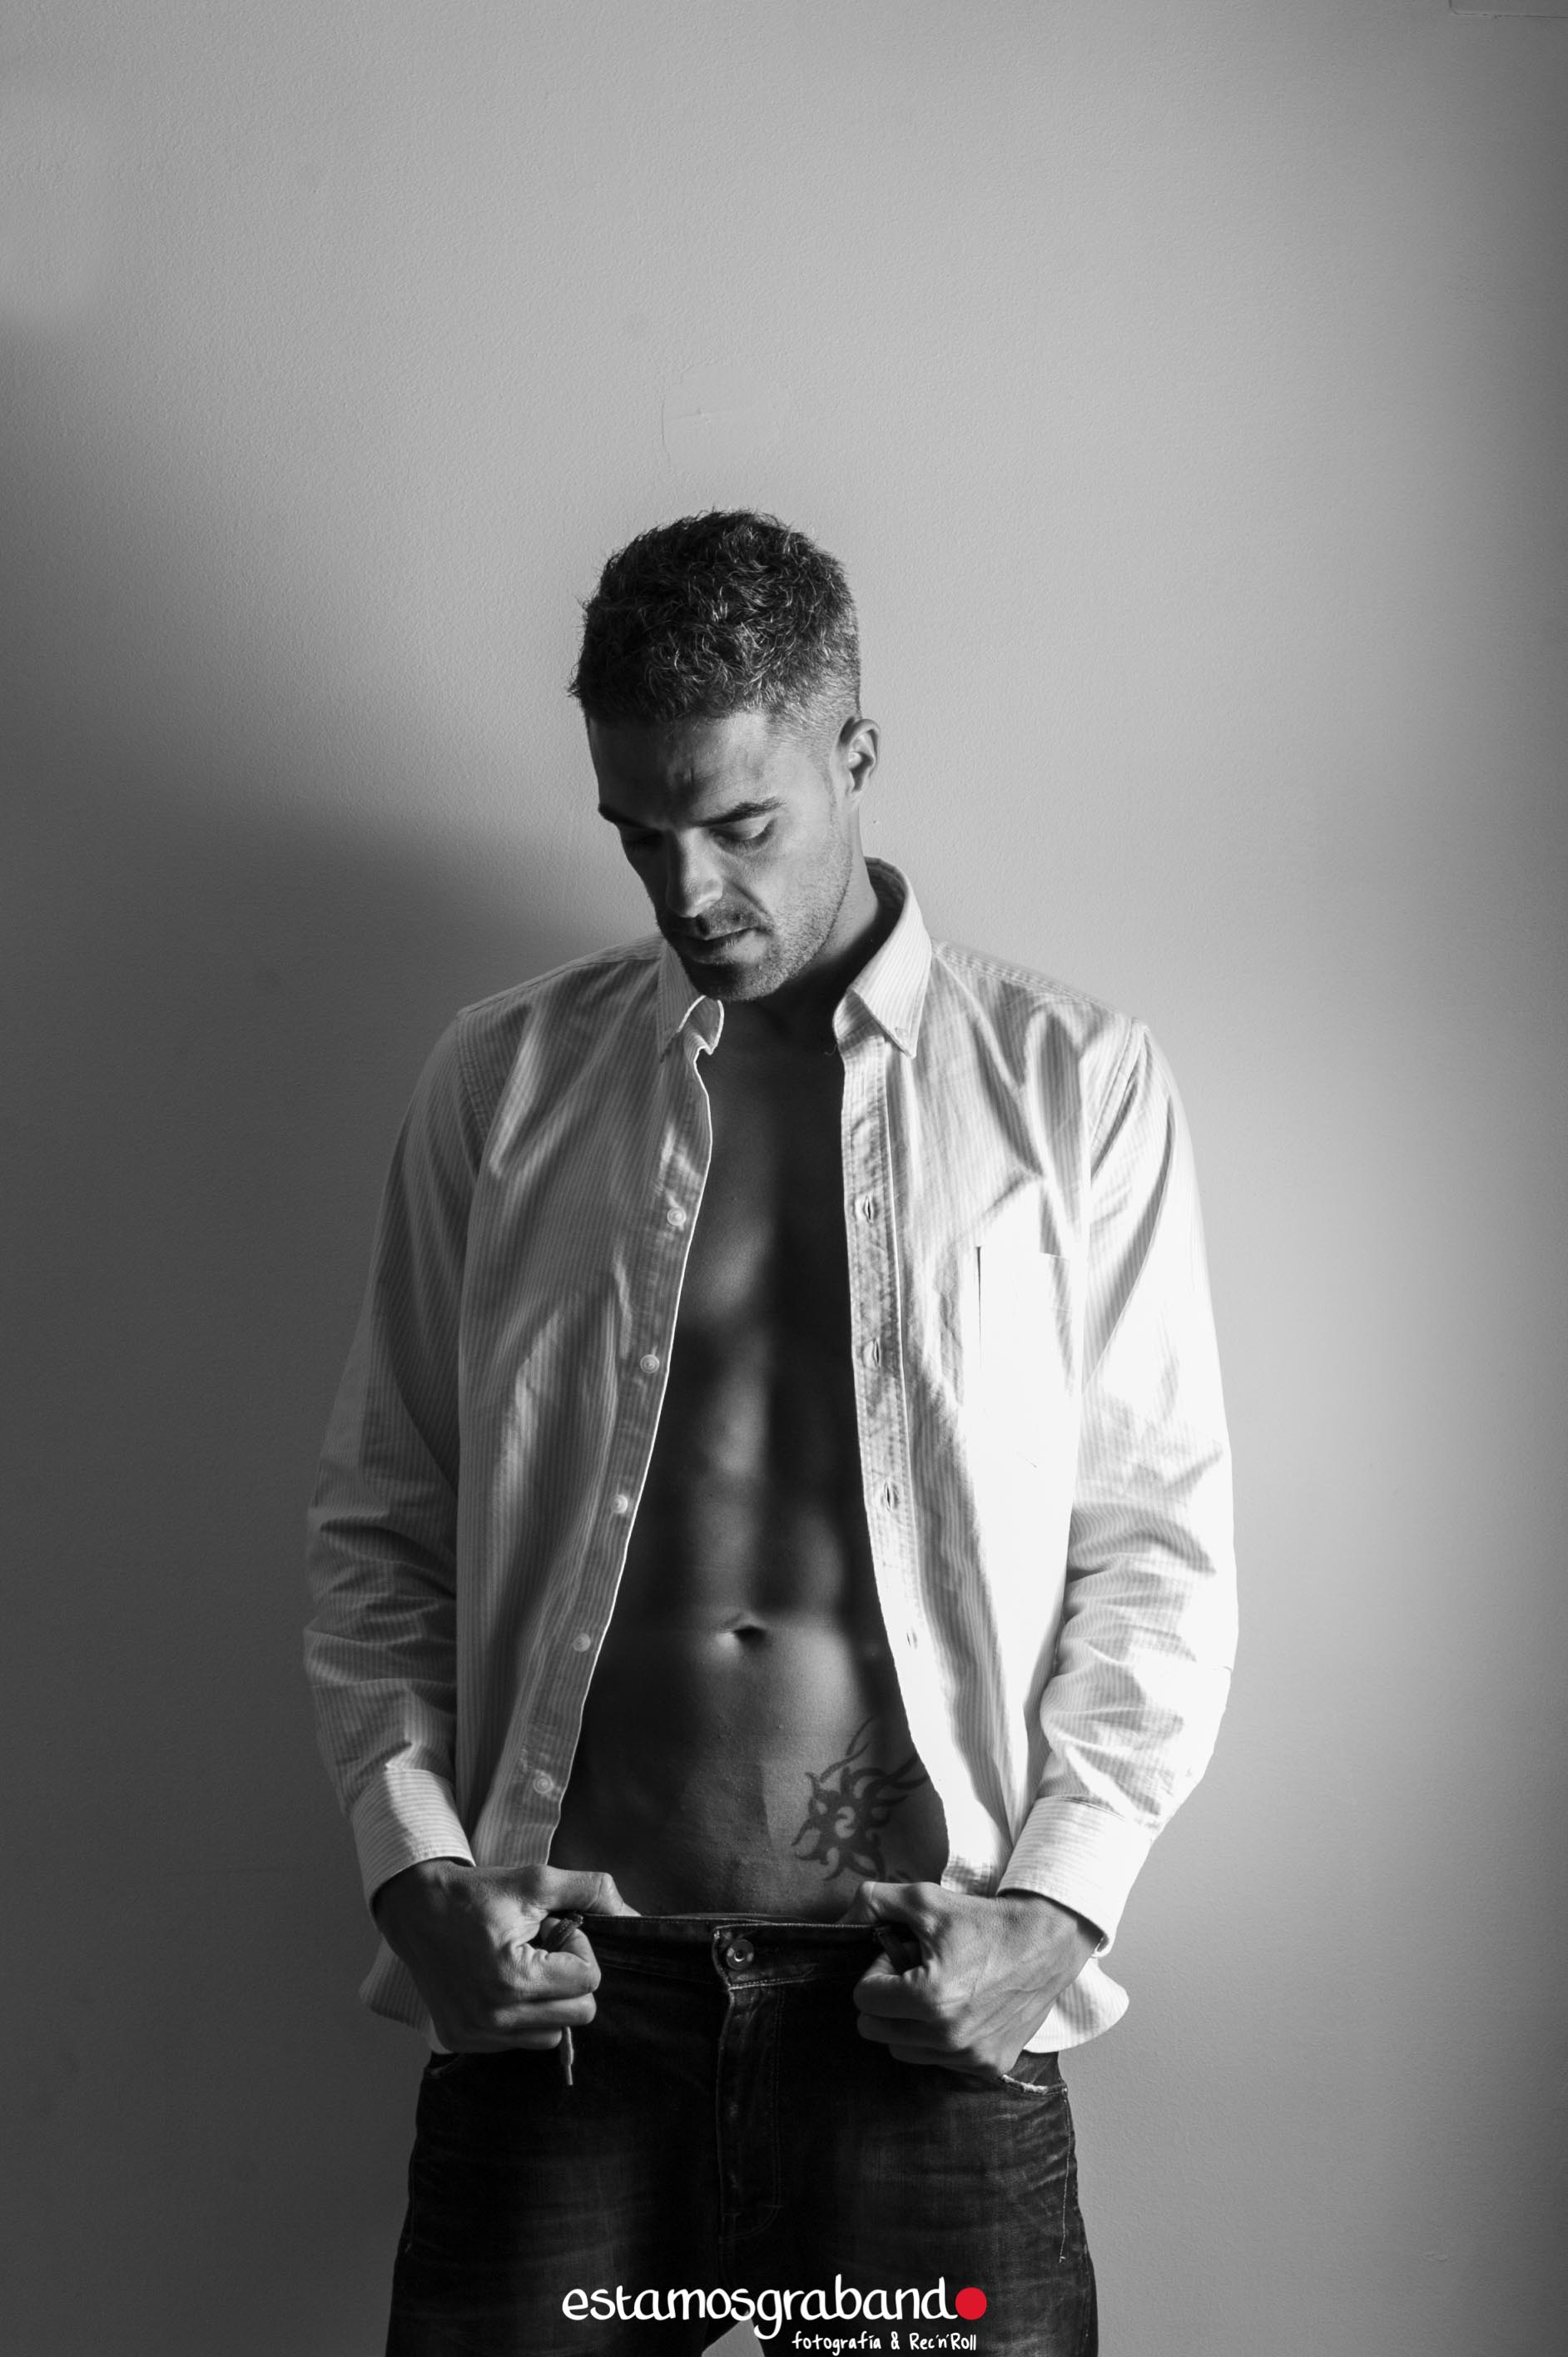 Fotograf a boudoir masculina estamosgrabando - Fotografia desnudo masculino ...